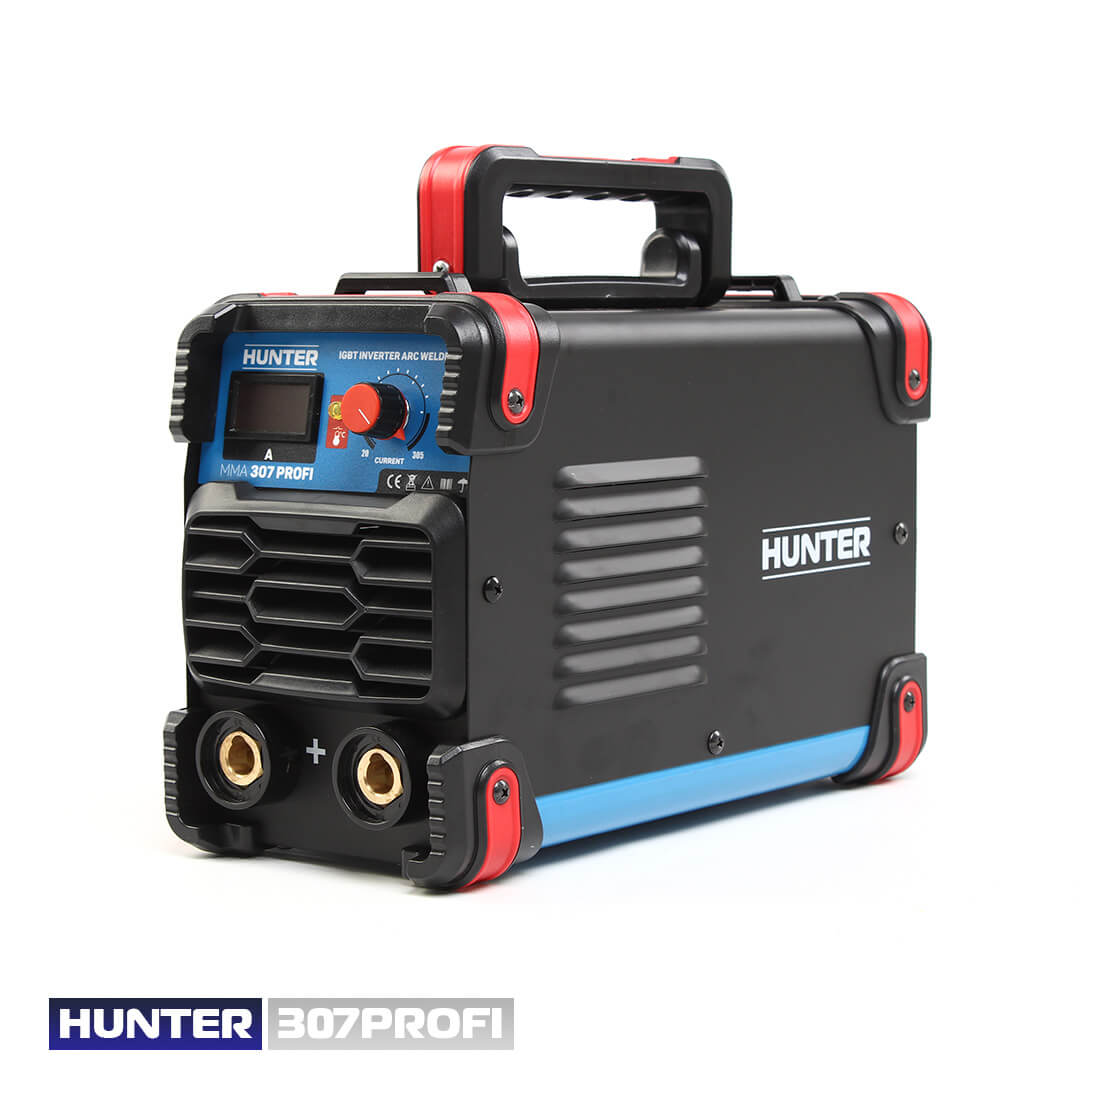 Фото Hunter MMA 307 PROFI (дуговая) цена 3150грн №8 — Hunter